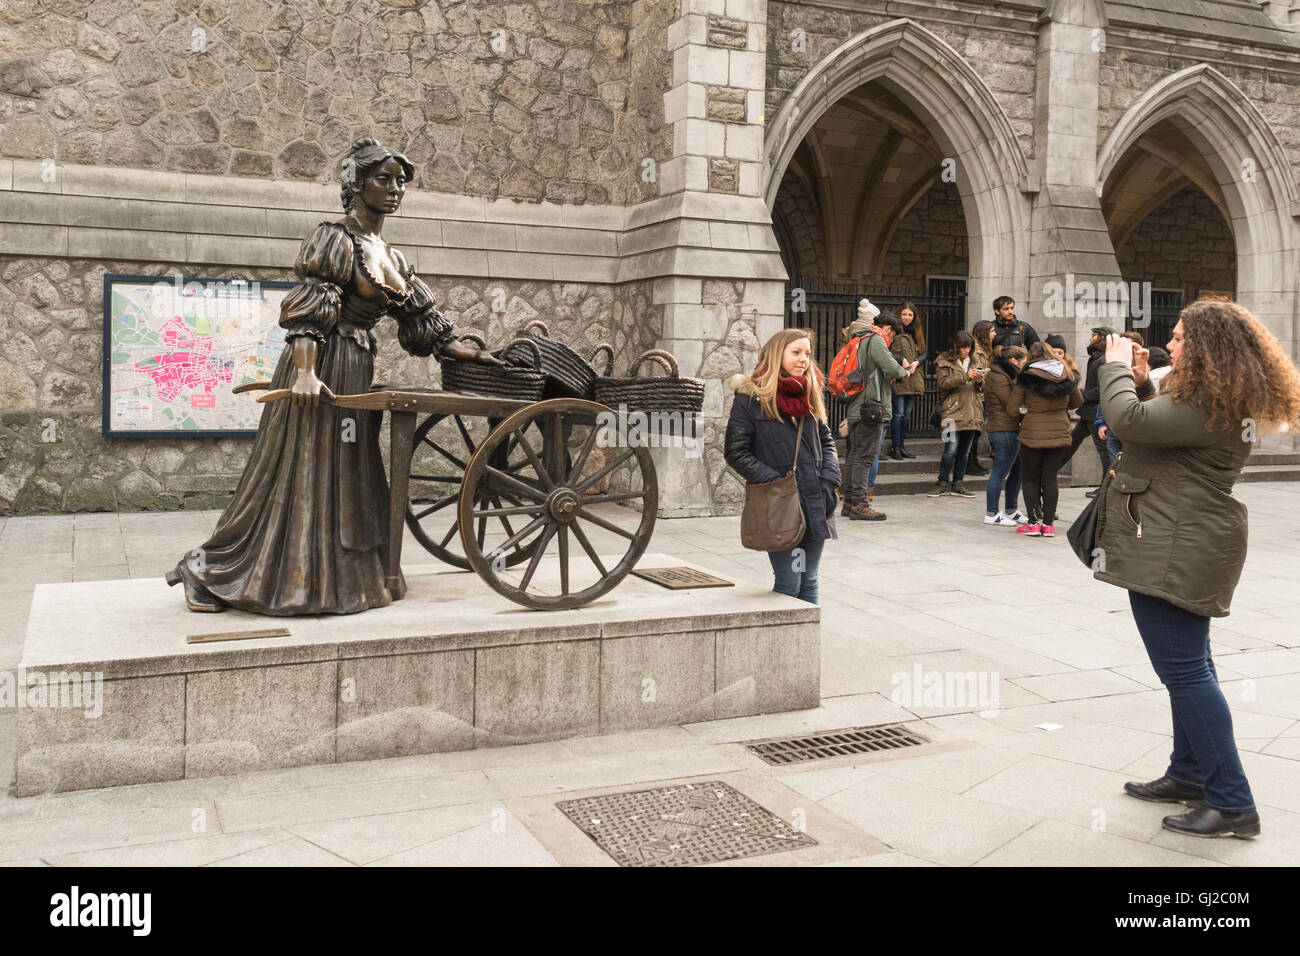 Molly Malone statue, Dublin, Ireland - Stock Image